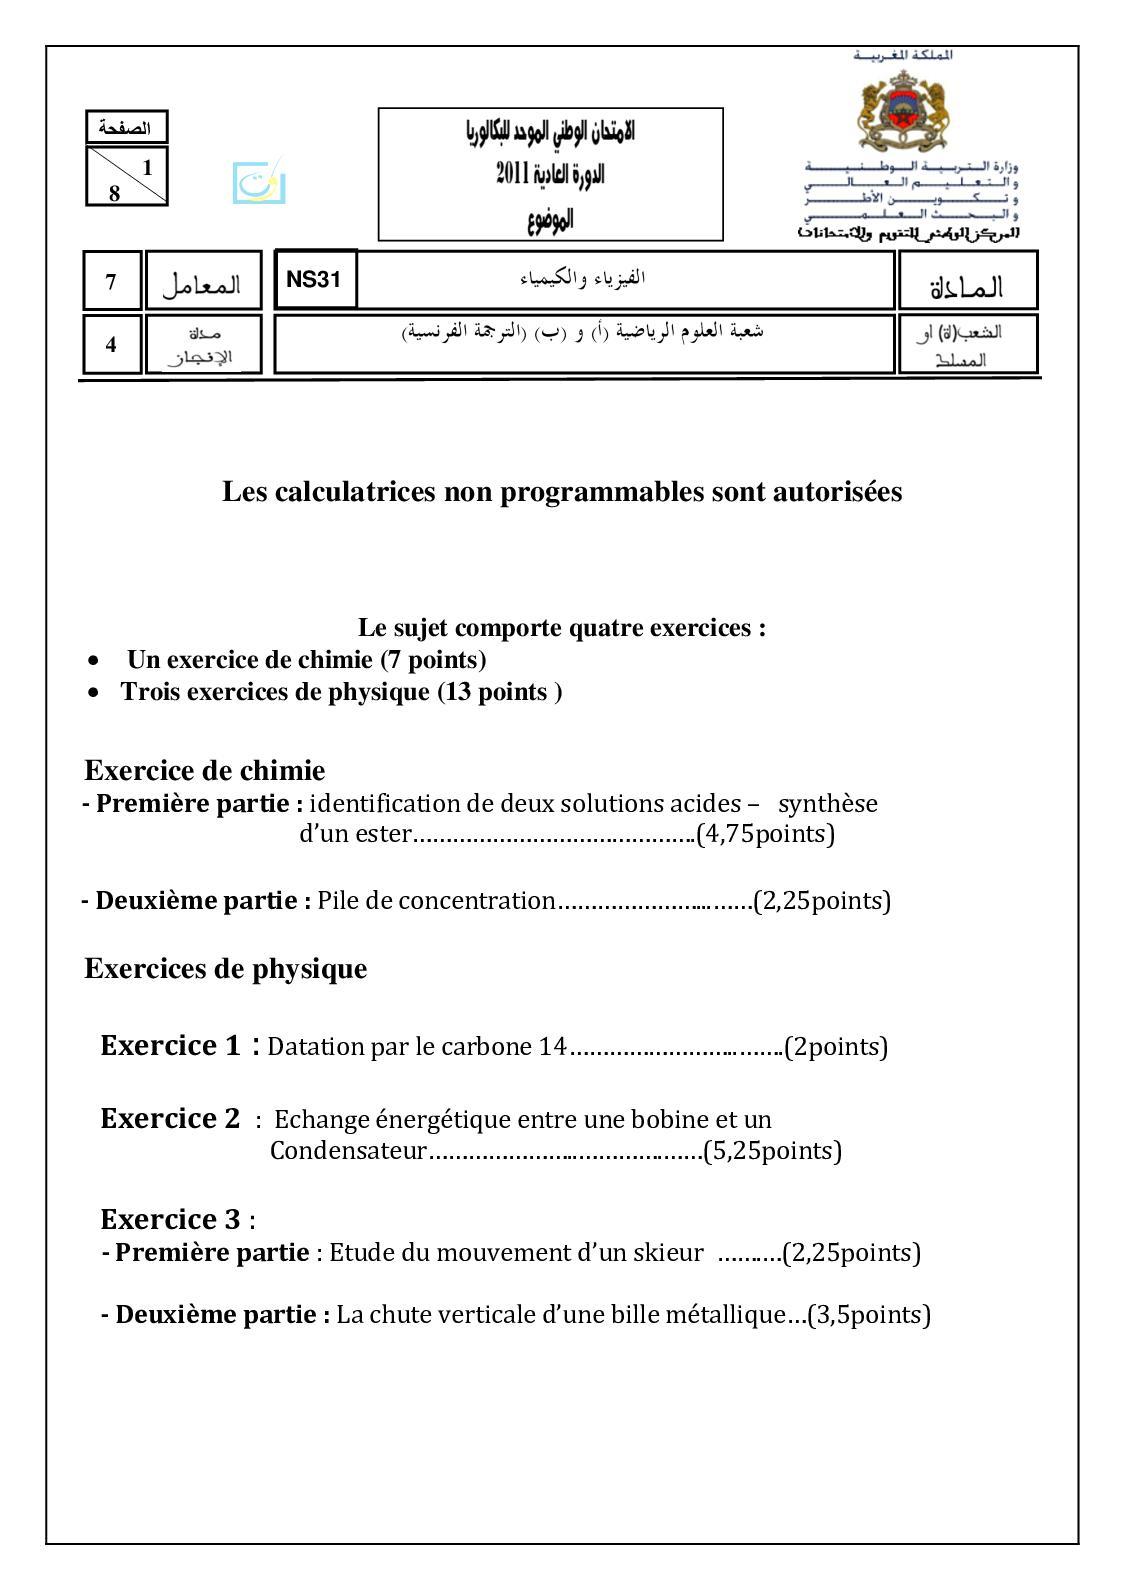 k-AR calculatrice de datation